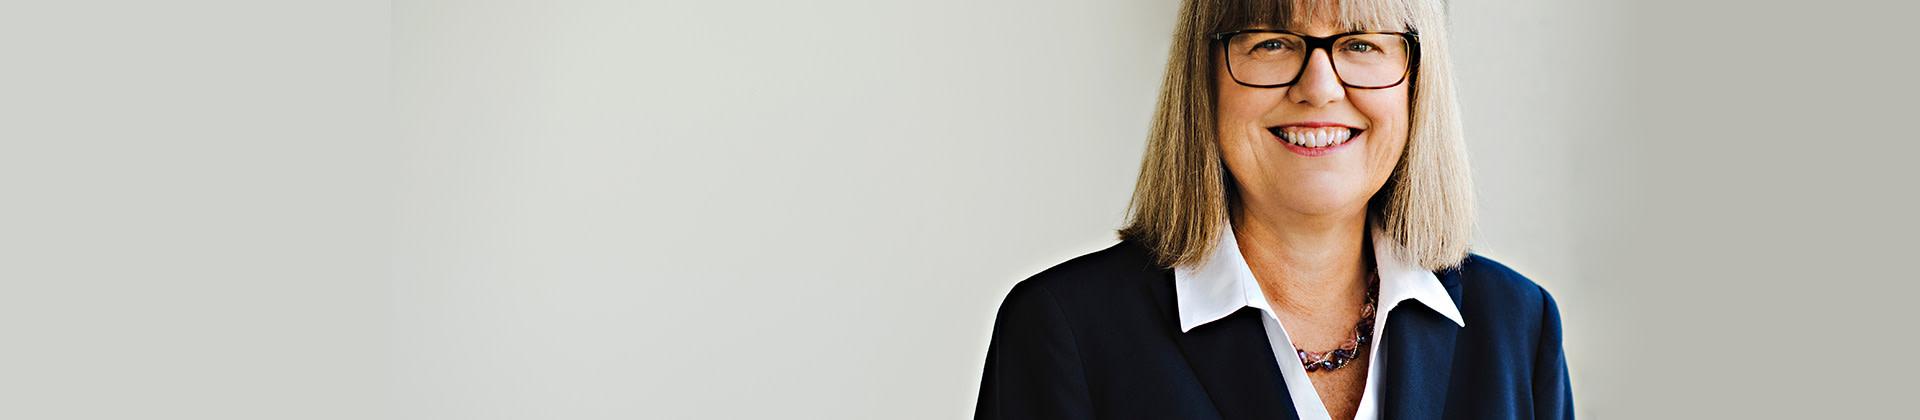 Portrait of Donna Strickland